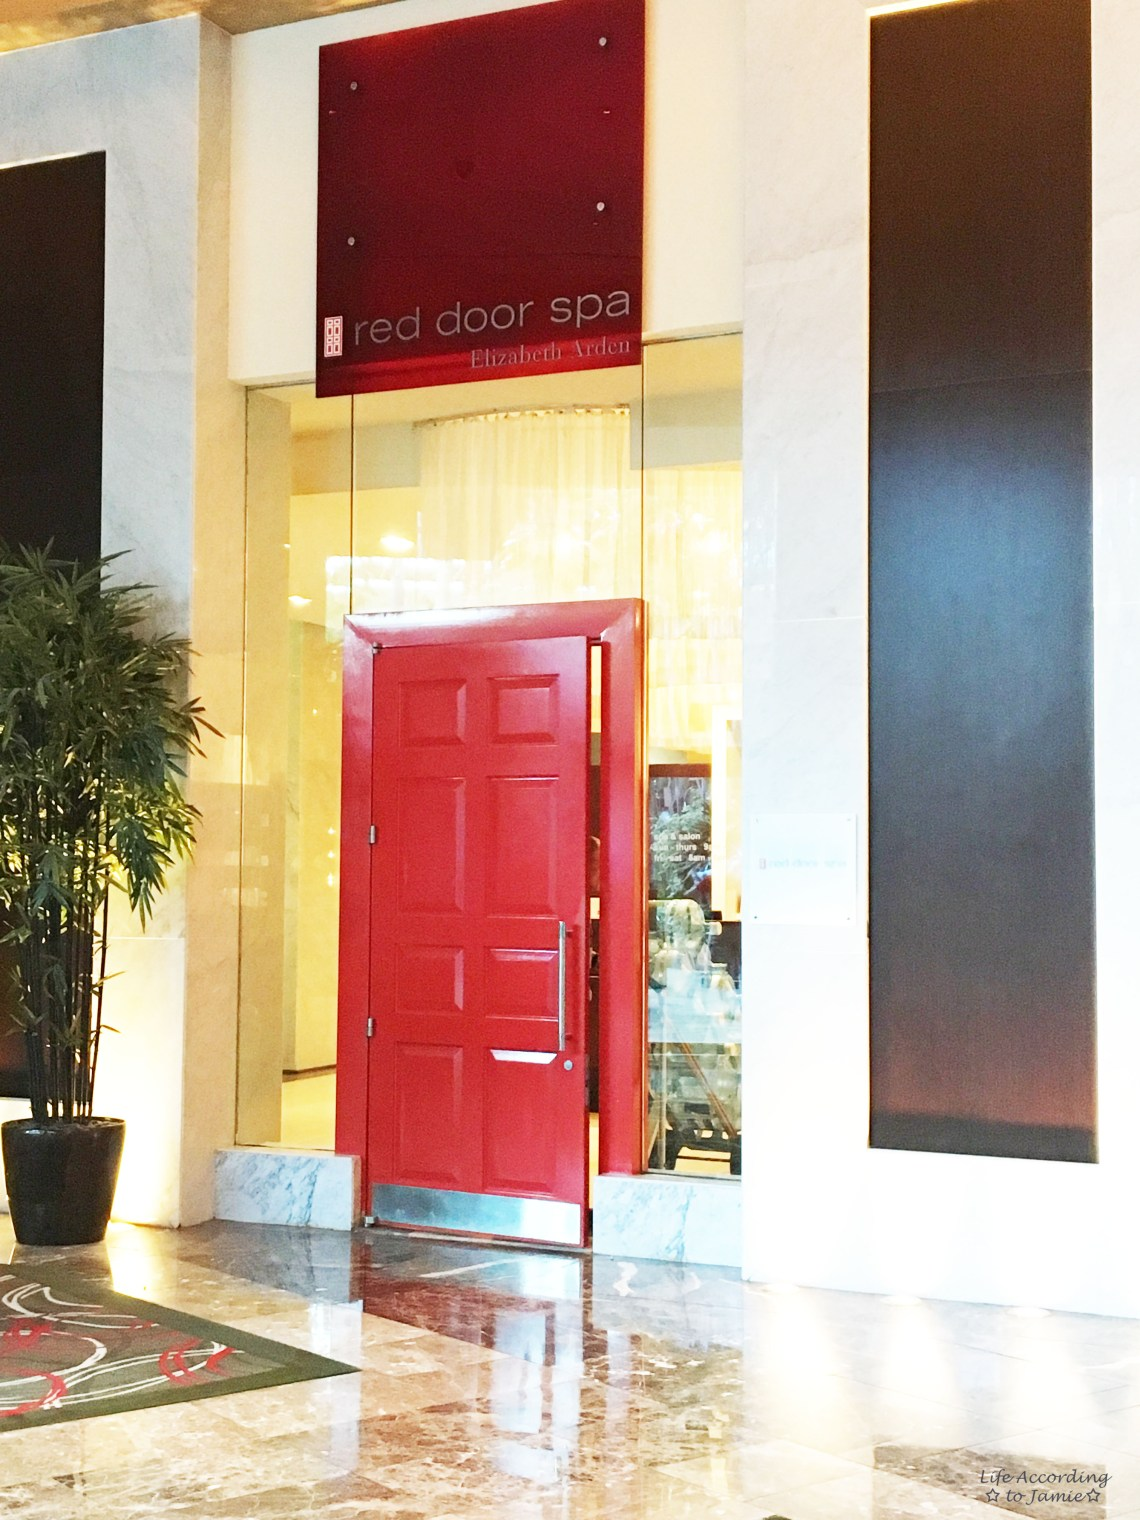 Elizabeth Arden Red Door Spa Life According To Jamie